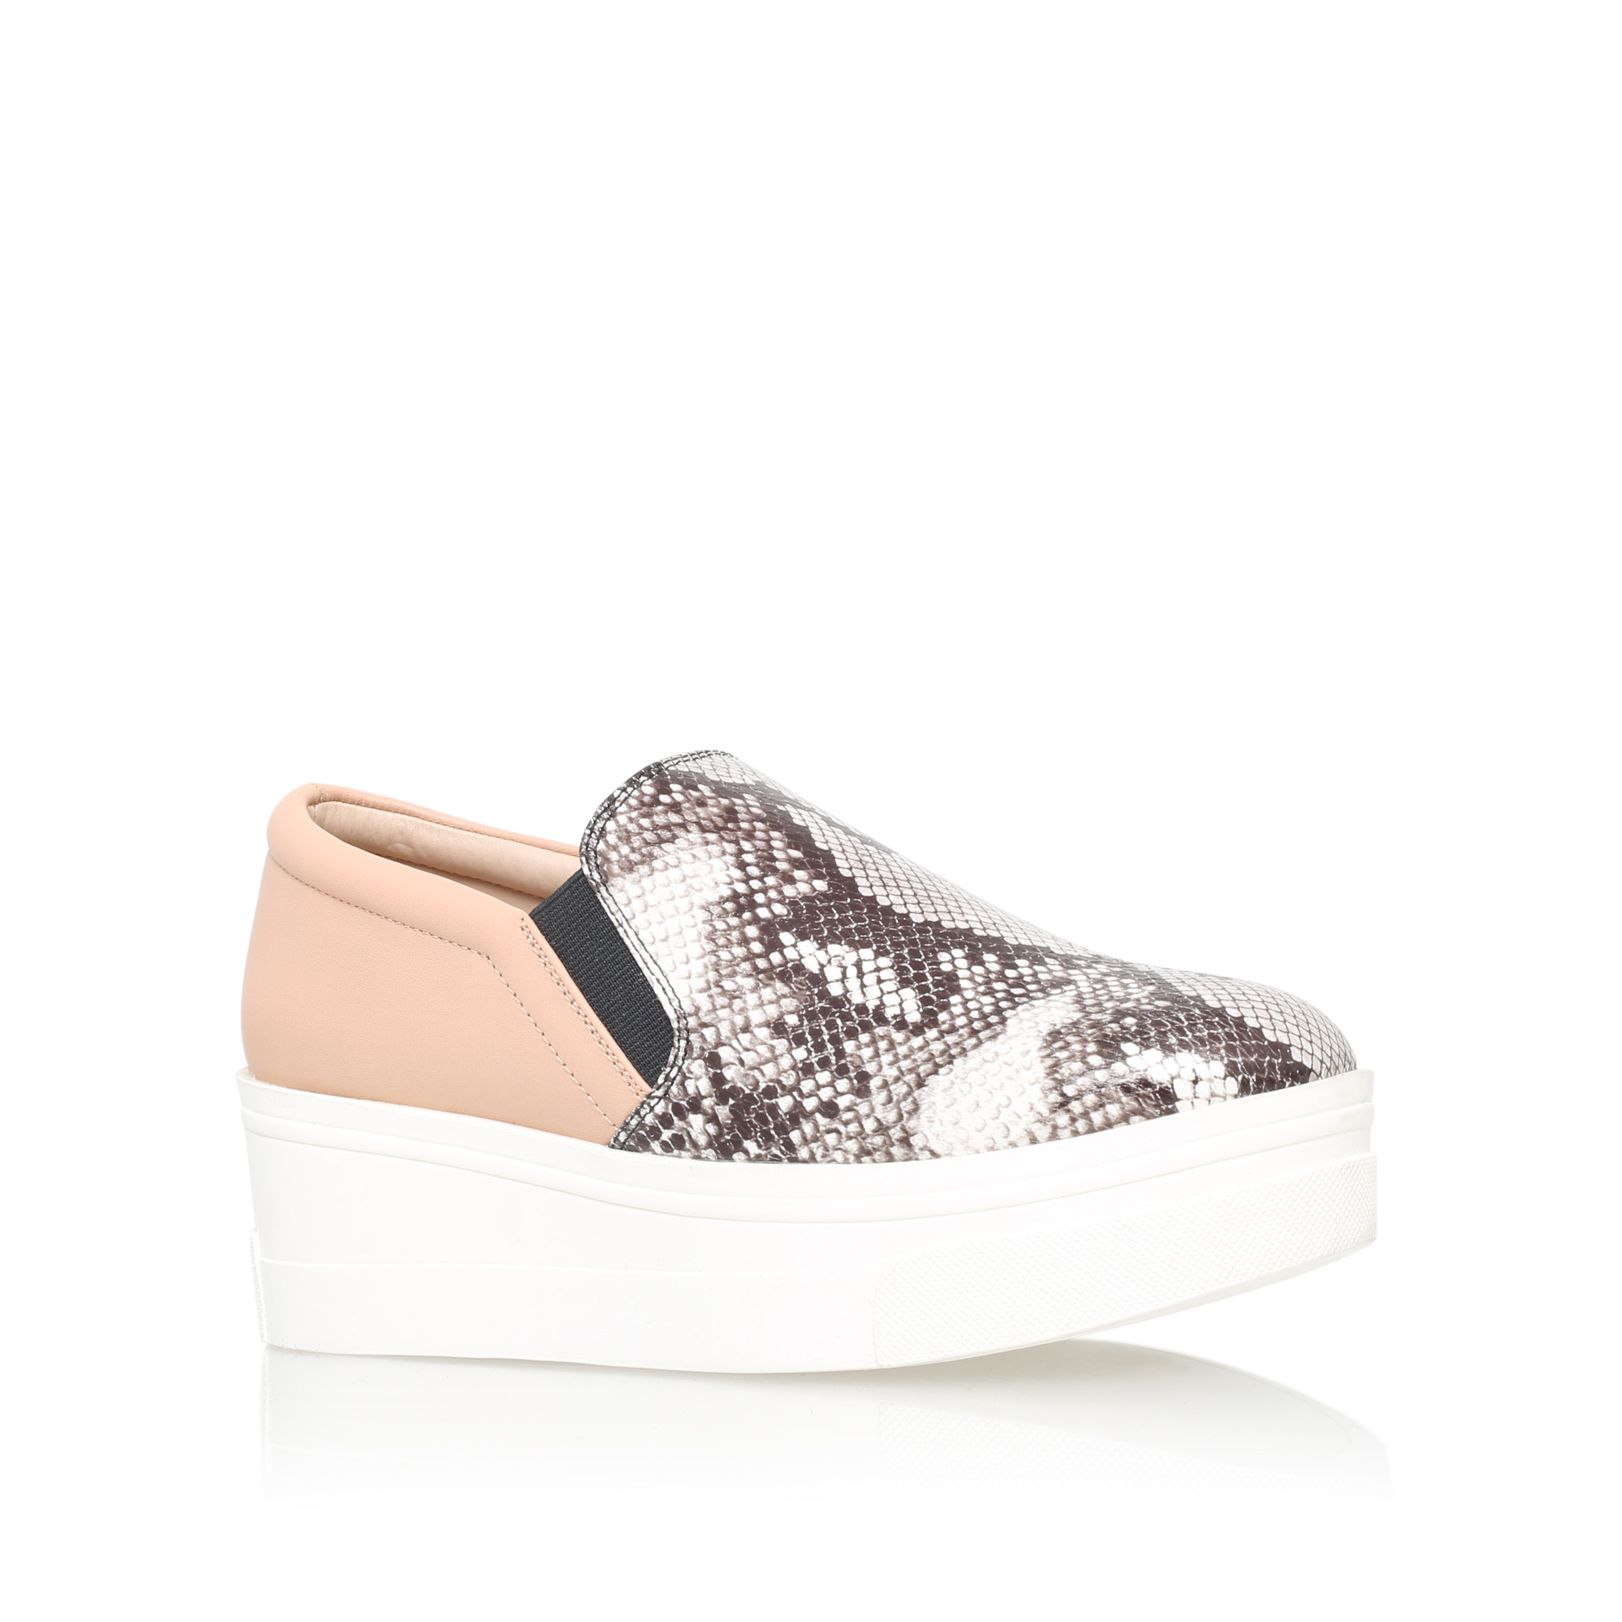 kg by kurt geiger lizard flat platform slip on shoes in